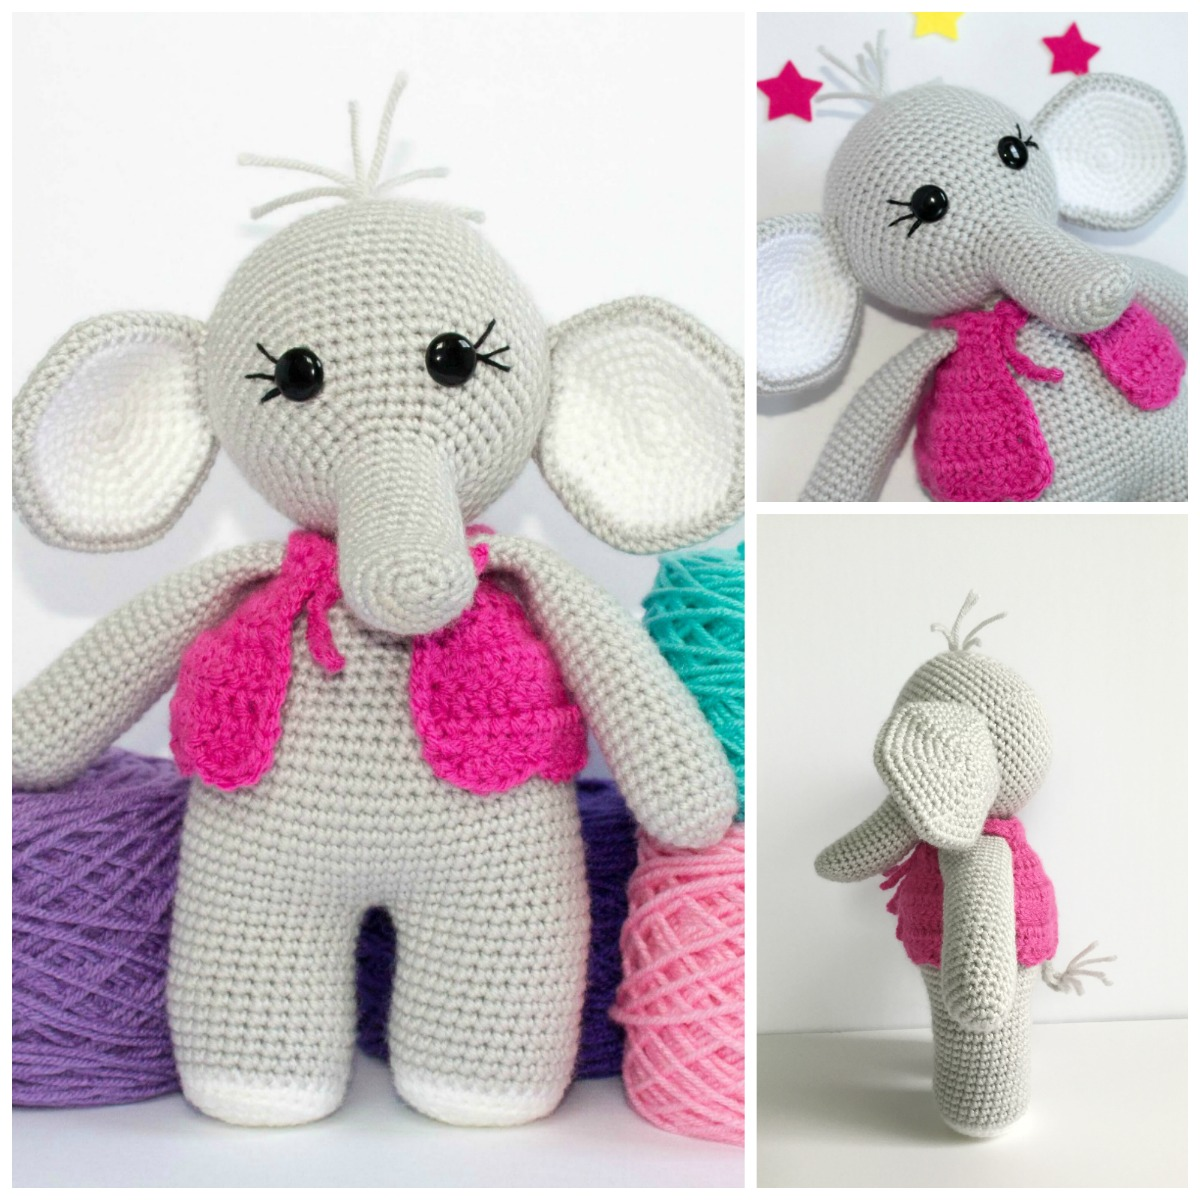 Crochet Elephant Amigurumi Easy Video Instructions | 1200x1200